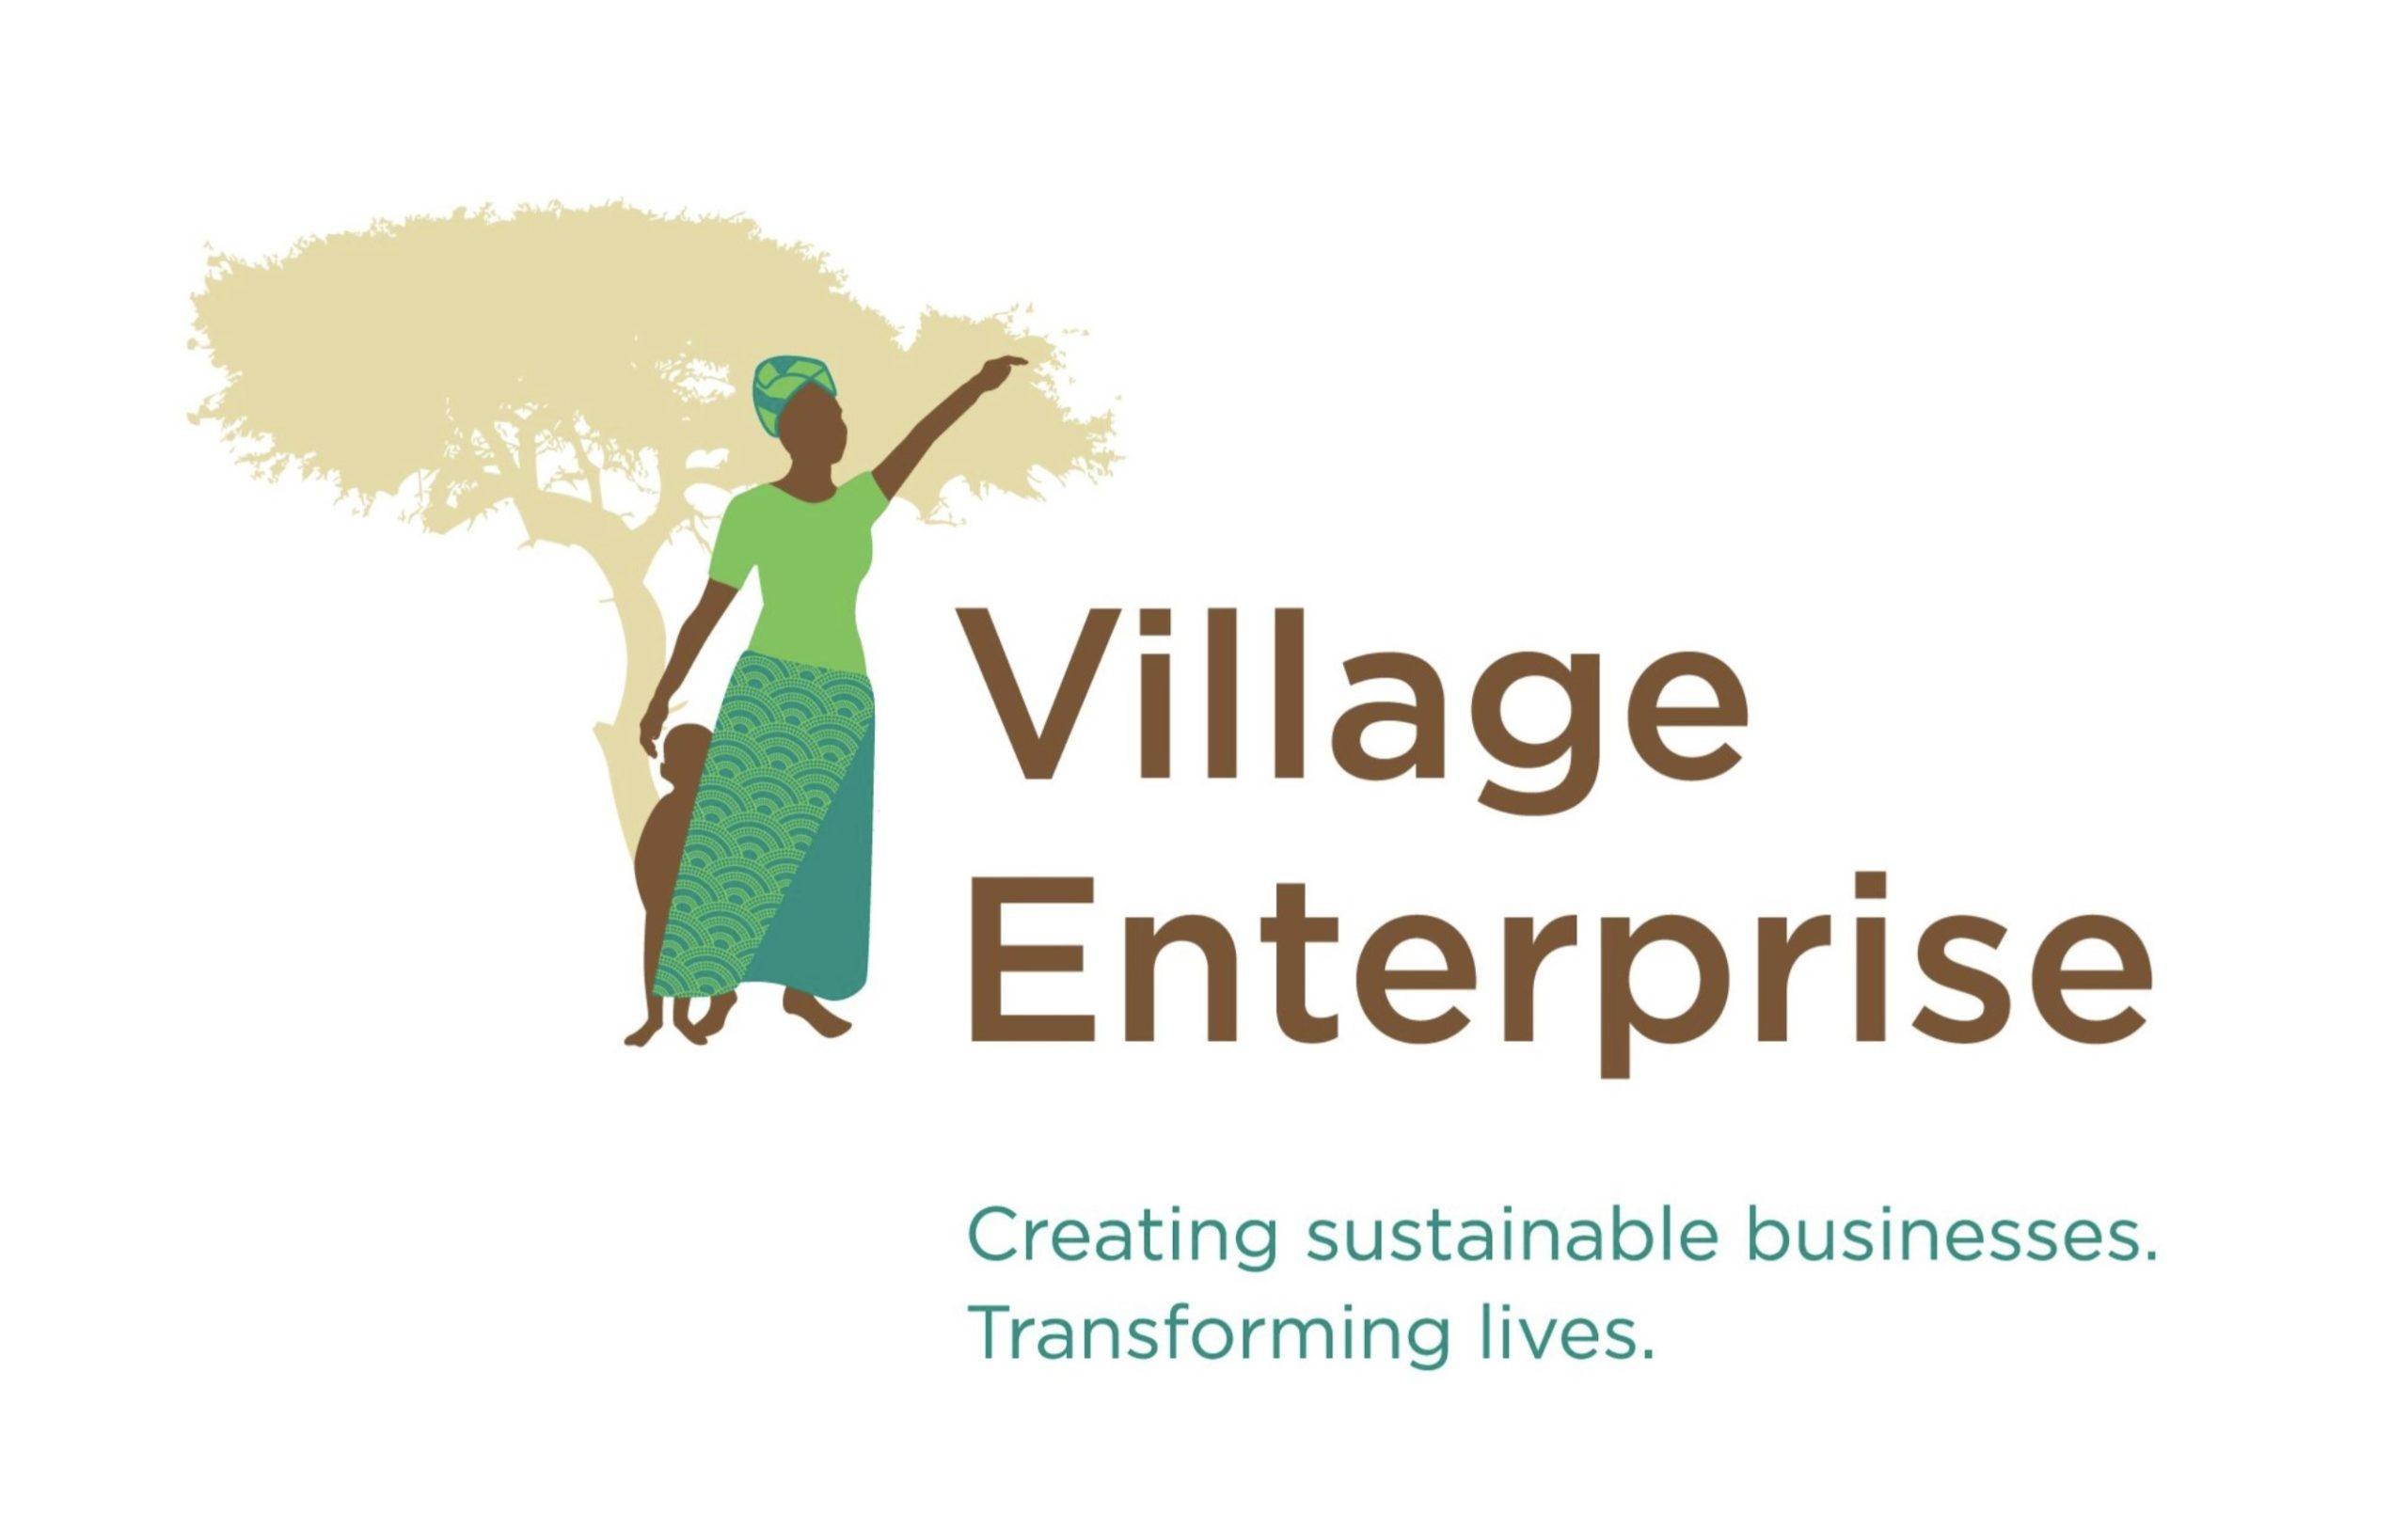 Village Enterprise